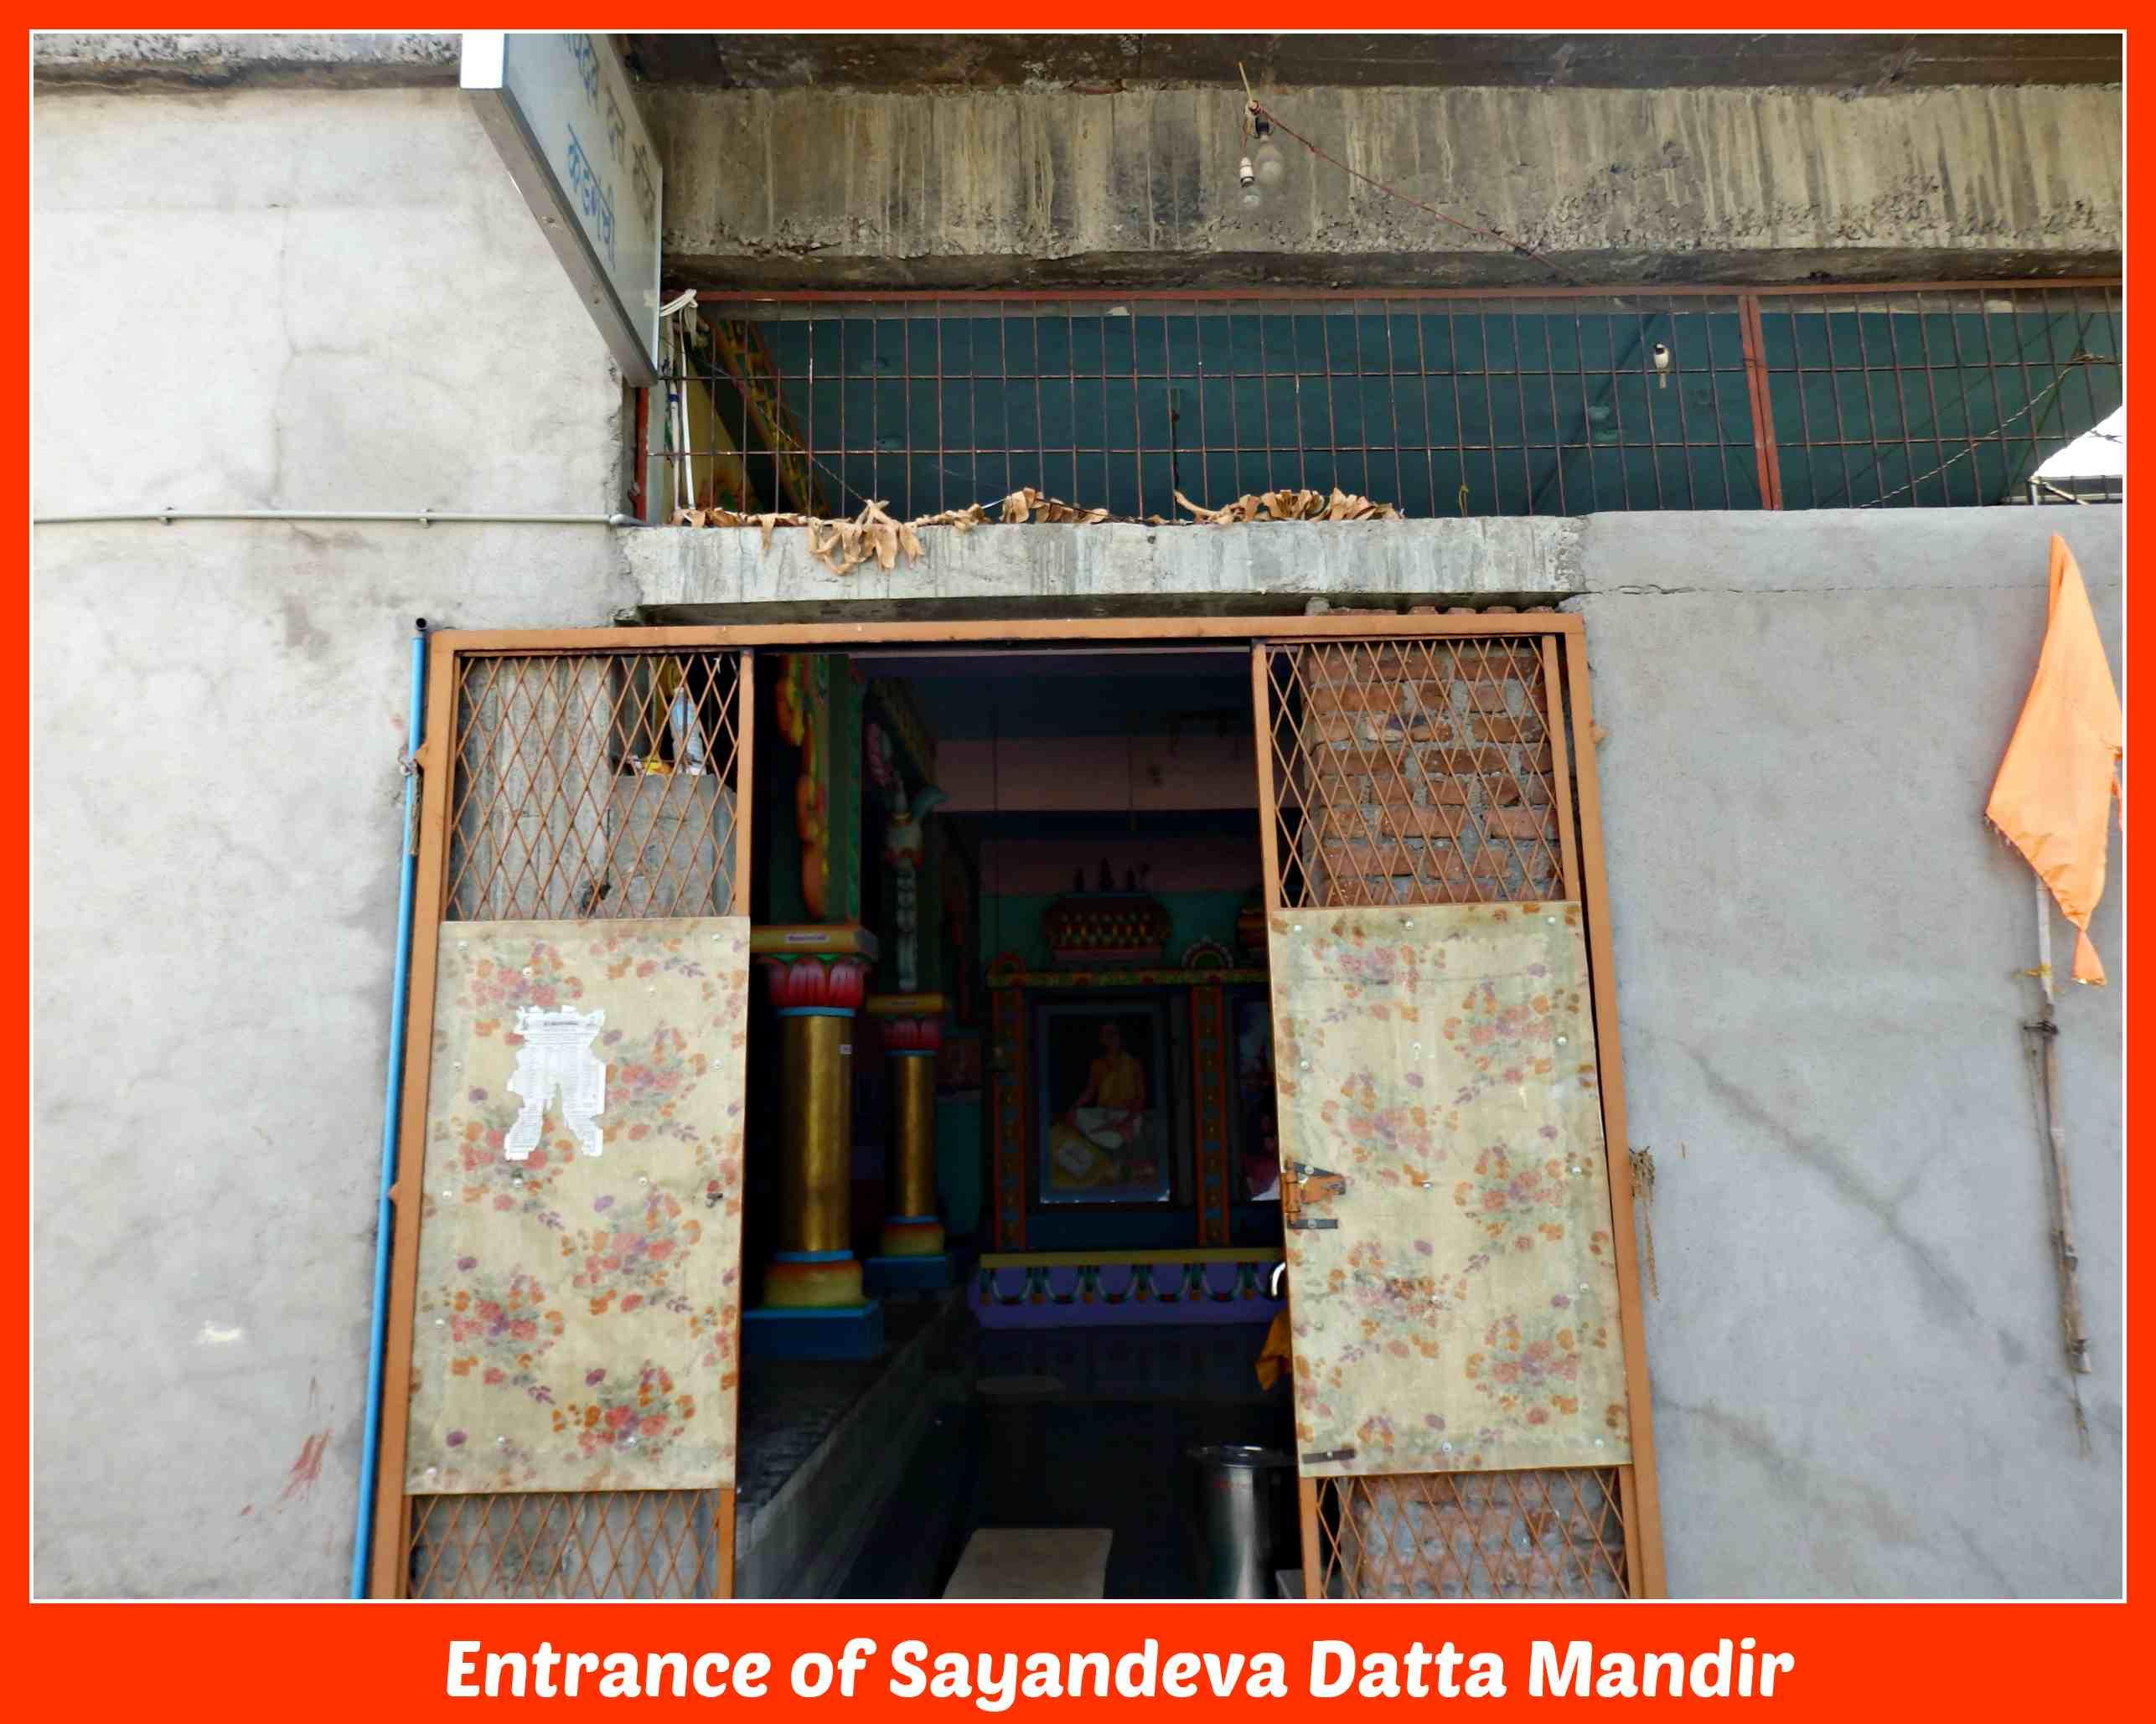 Kadaganchi Sayandeva KarunaPaduka Datta Kshetram (Sri Sayandeva House)